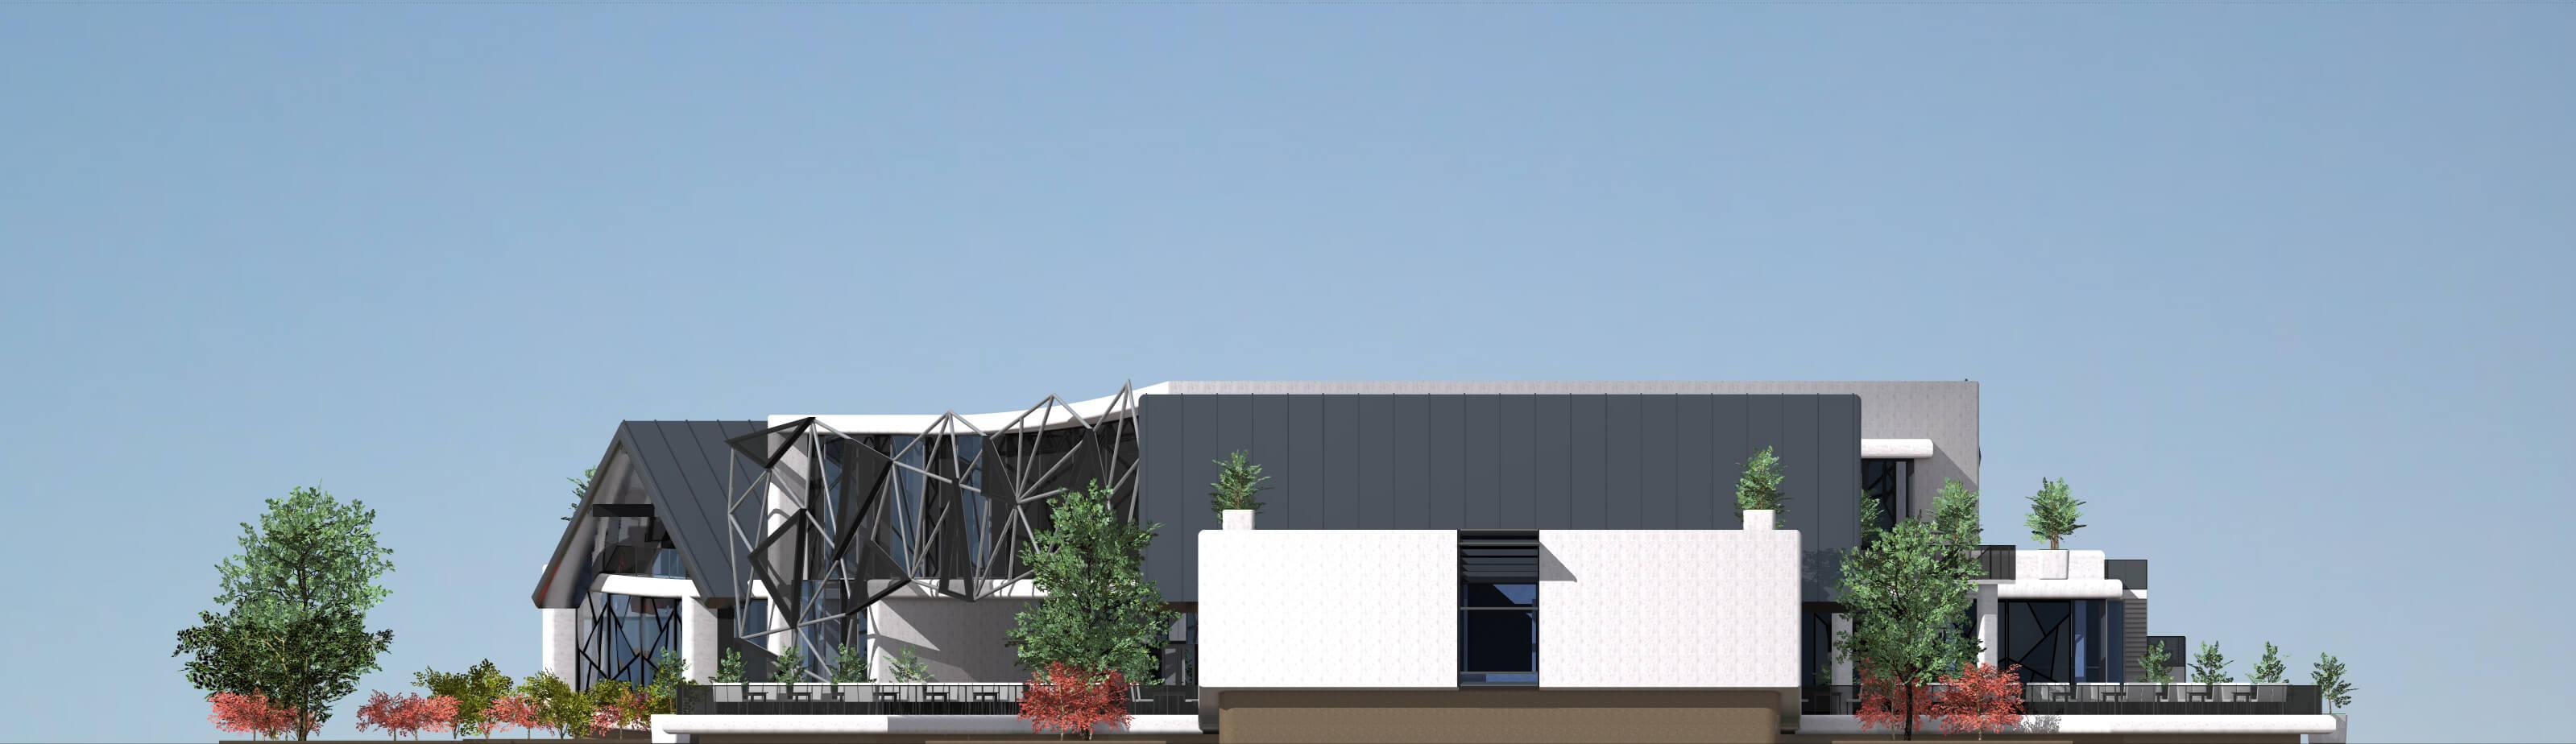 Каскад-Будинвест: проекты компании (изображение 35)